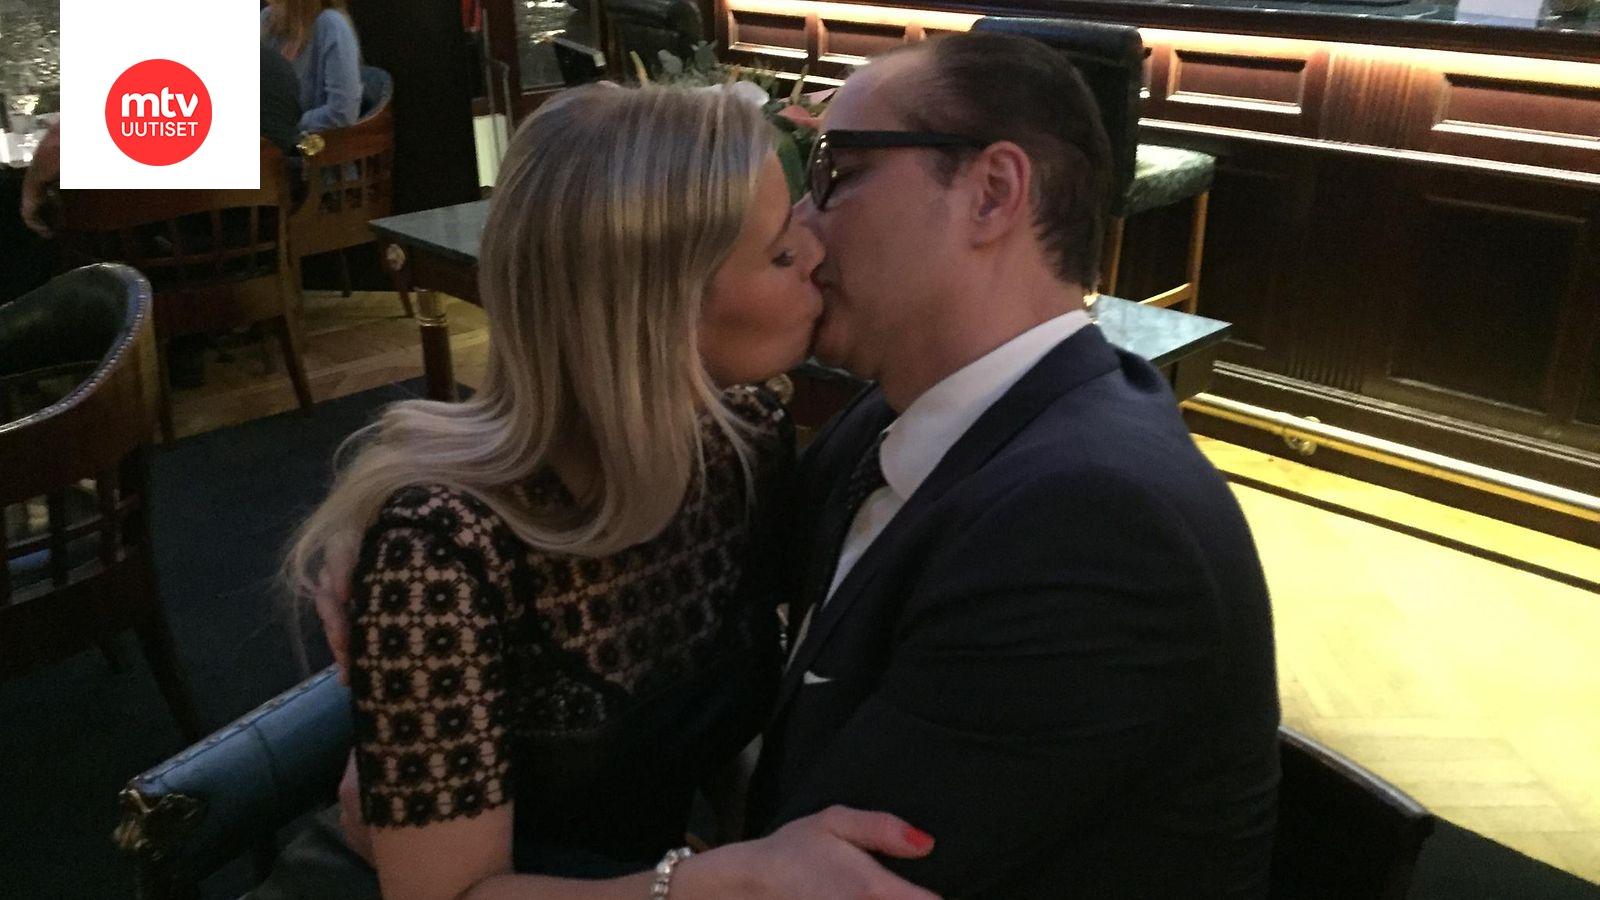 Kaley Cuoco dating Ryan